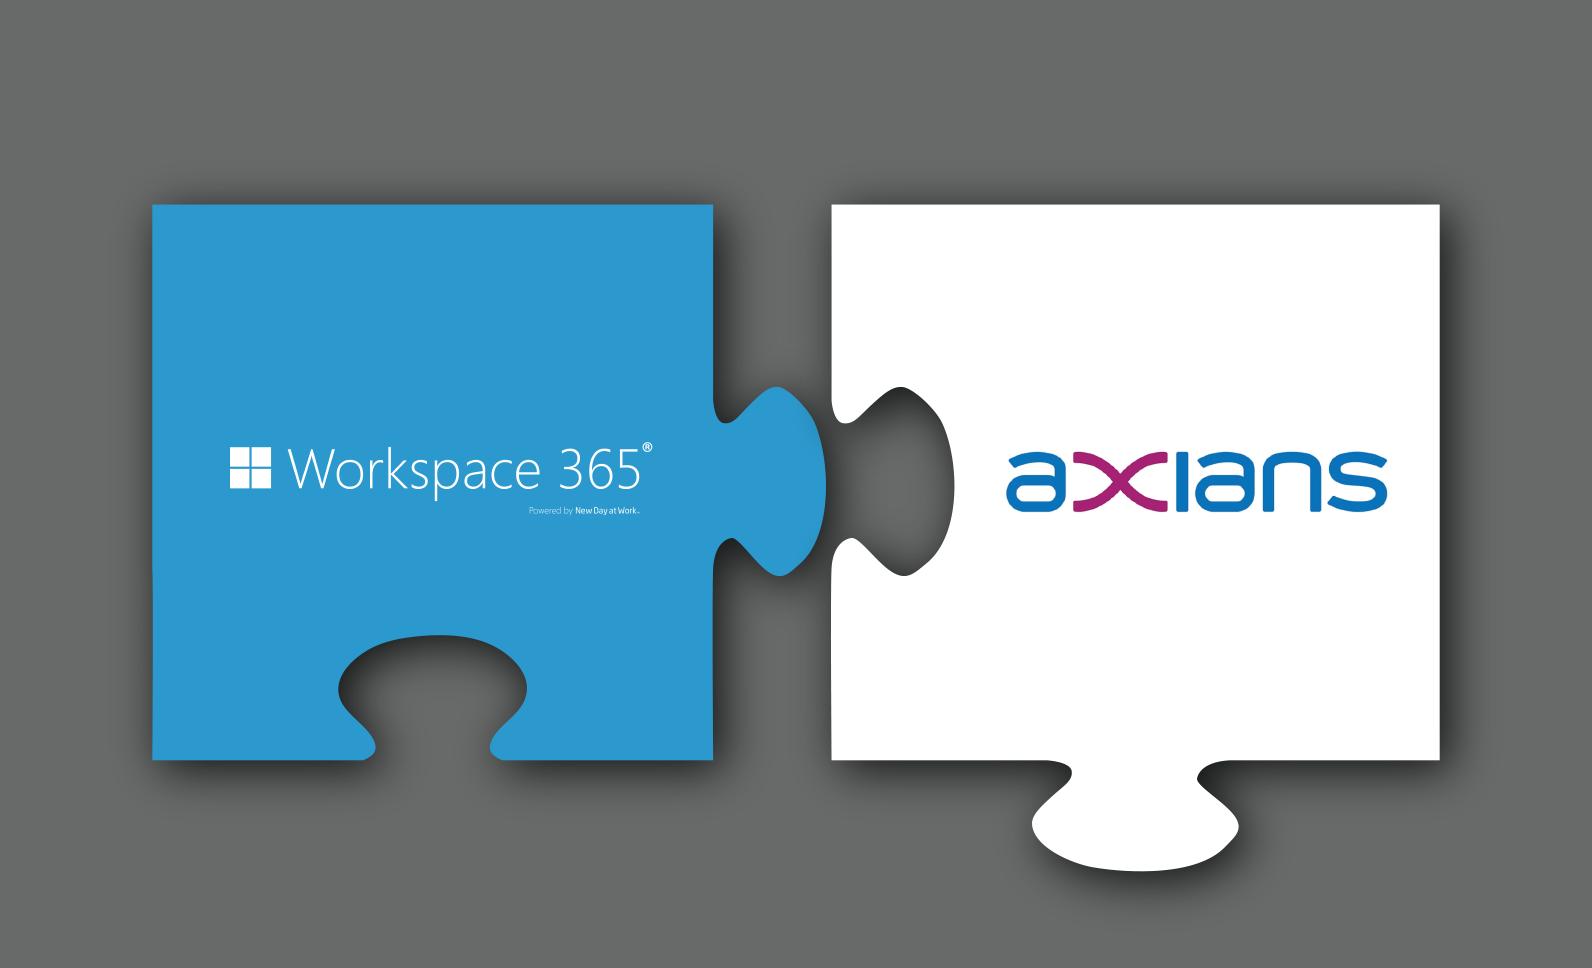 Axians partner Workspace 365